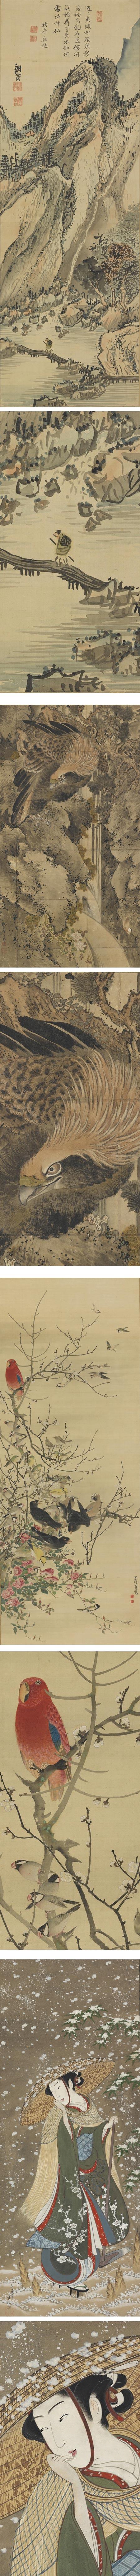 Edo Period Painting: Japanese Masterworks from the Feinberg Collection, Metropolitan Museum - of Art   Yosa Buson, Ganku, Nagasawa Rosetsu, Toensai Kanshi